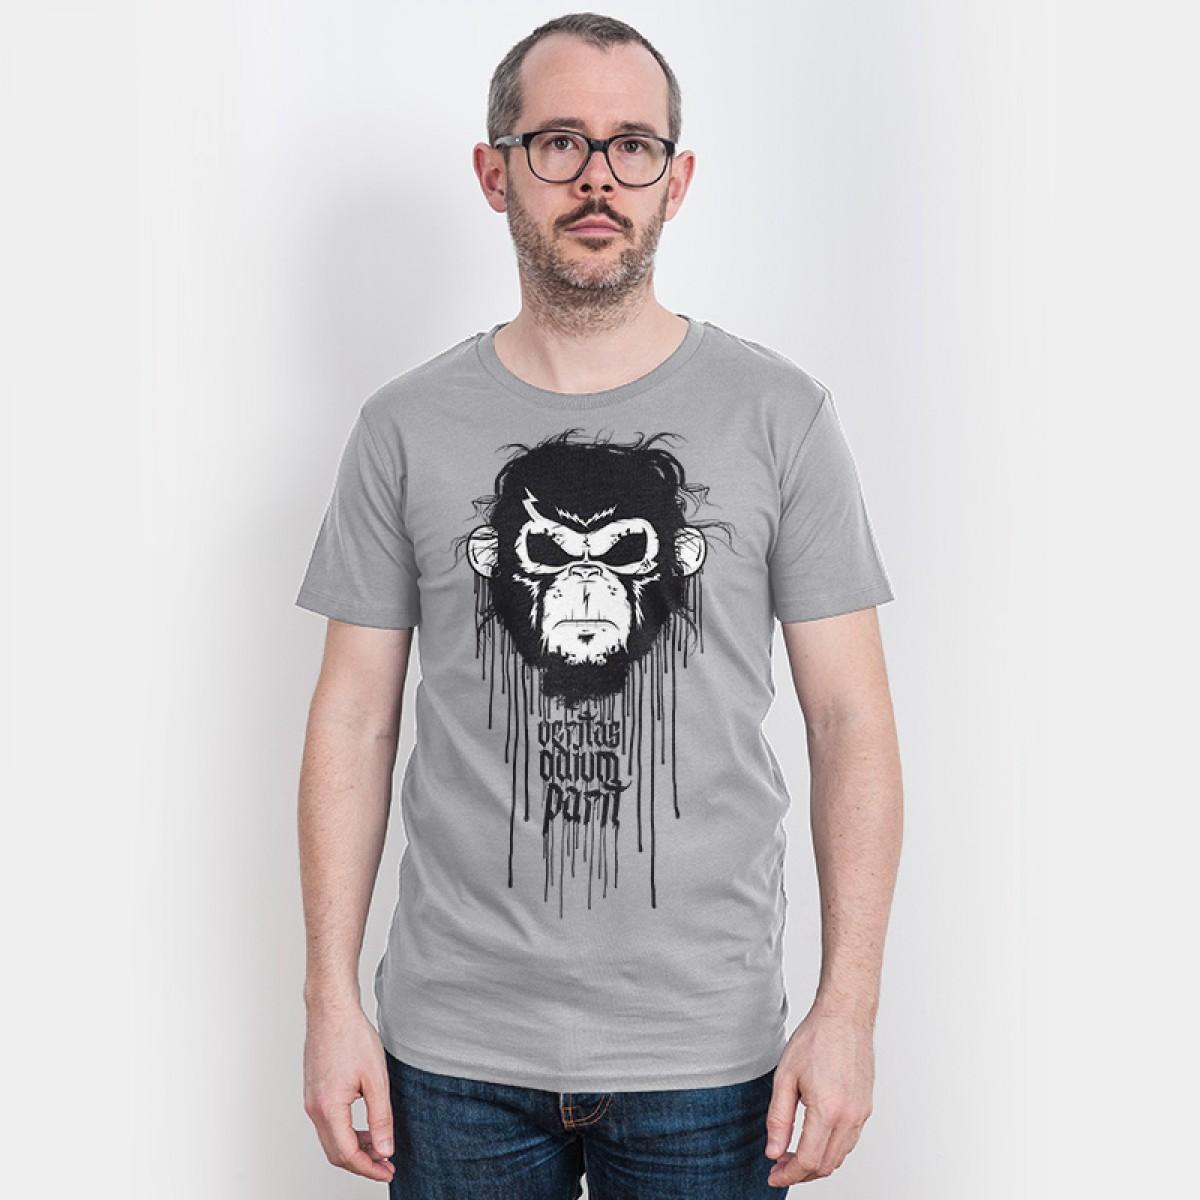 Jase34 – Veritas Odium Parit - Organic Cotton T-Shirt